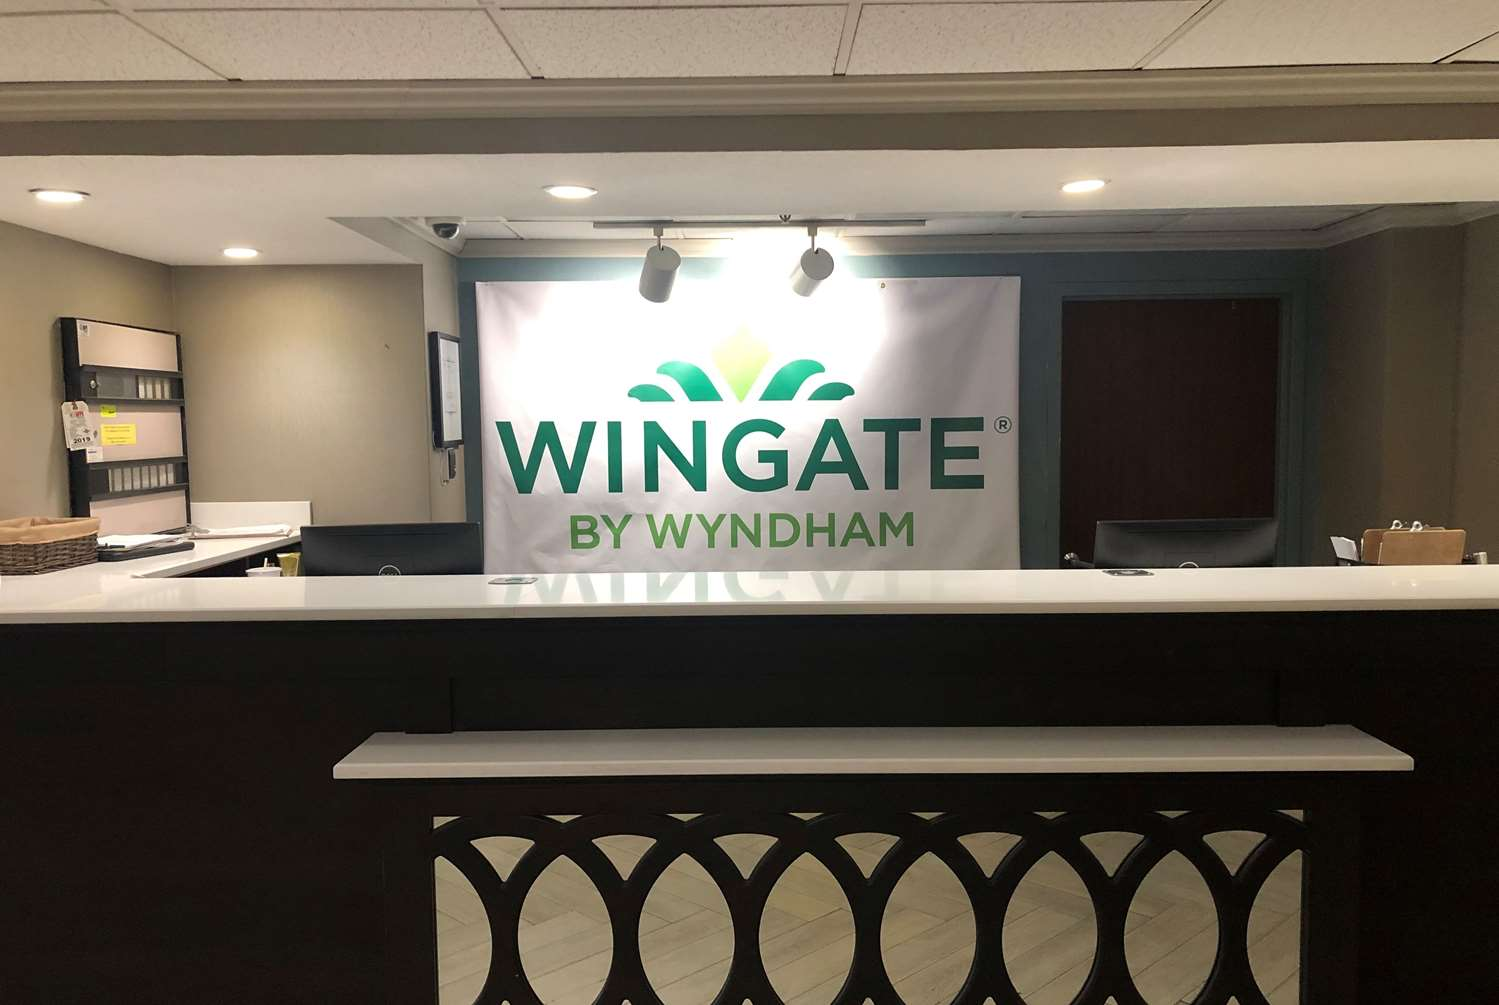 Lobby - Wingate by Wyndham Hotel Linthicum